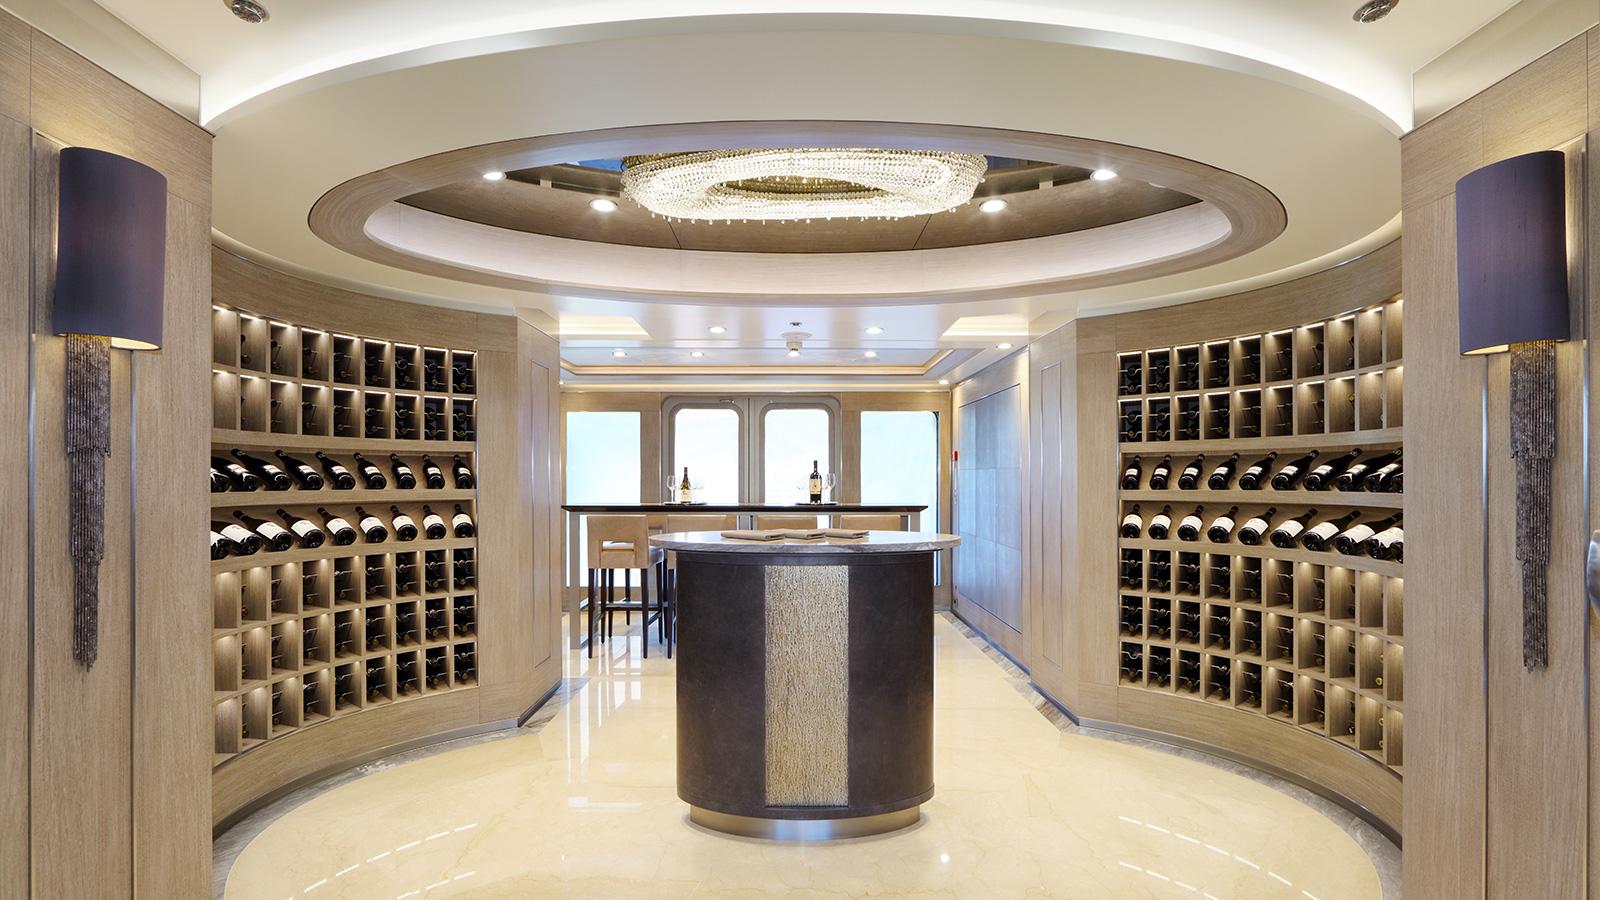 the-wine-cellar-on-kleven-explorer-yacht-ulysses